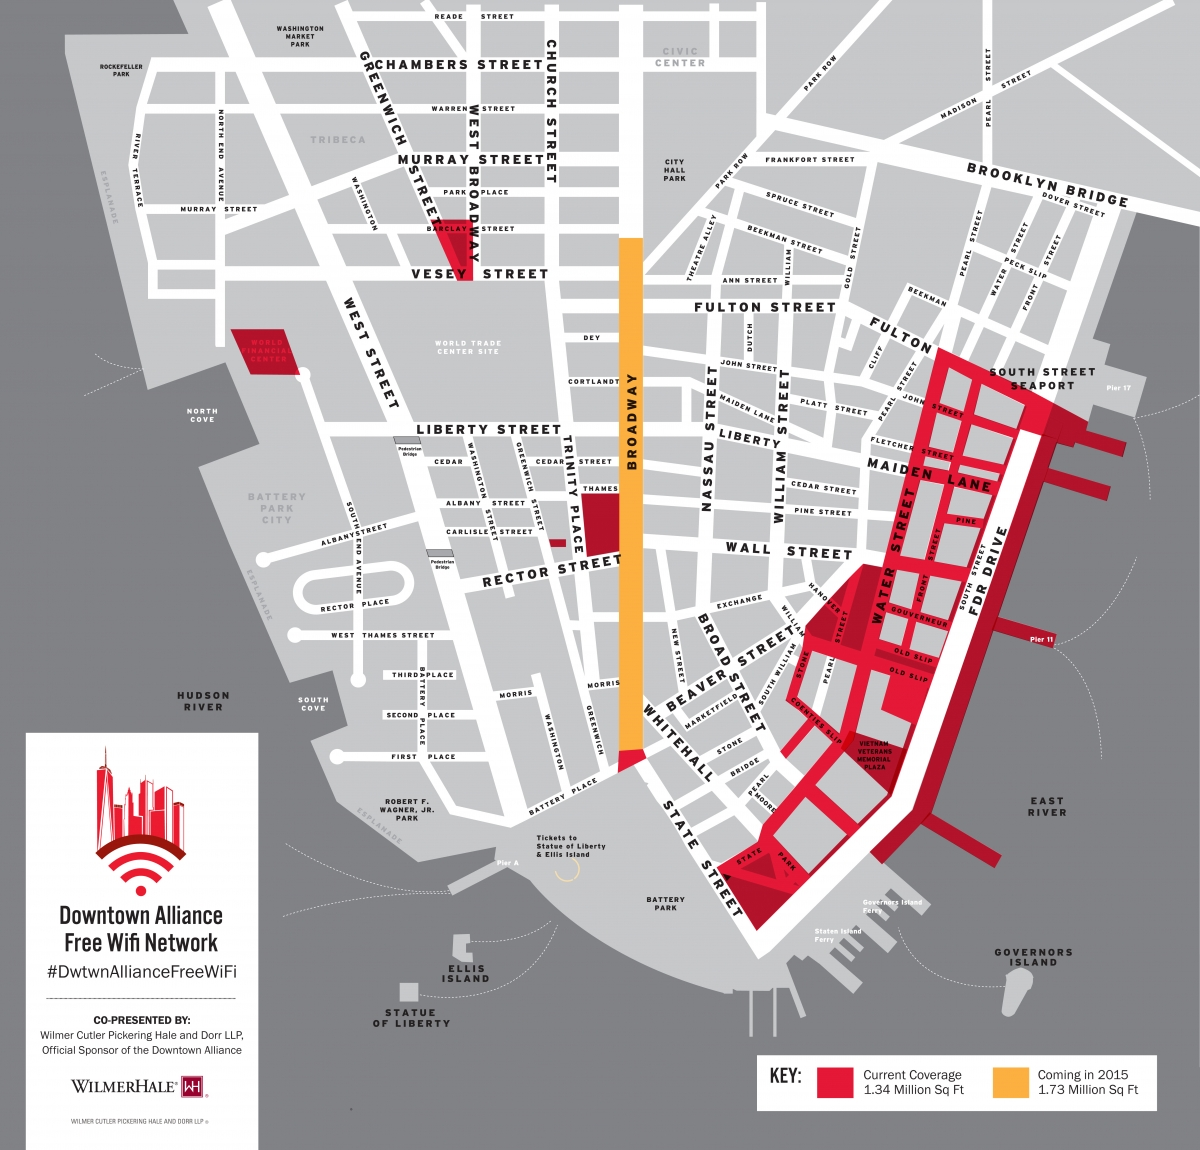 wall street wifi map